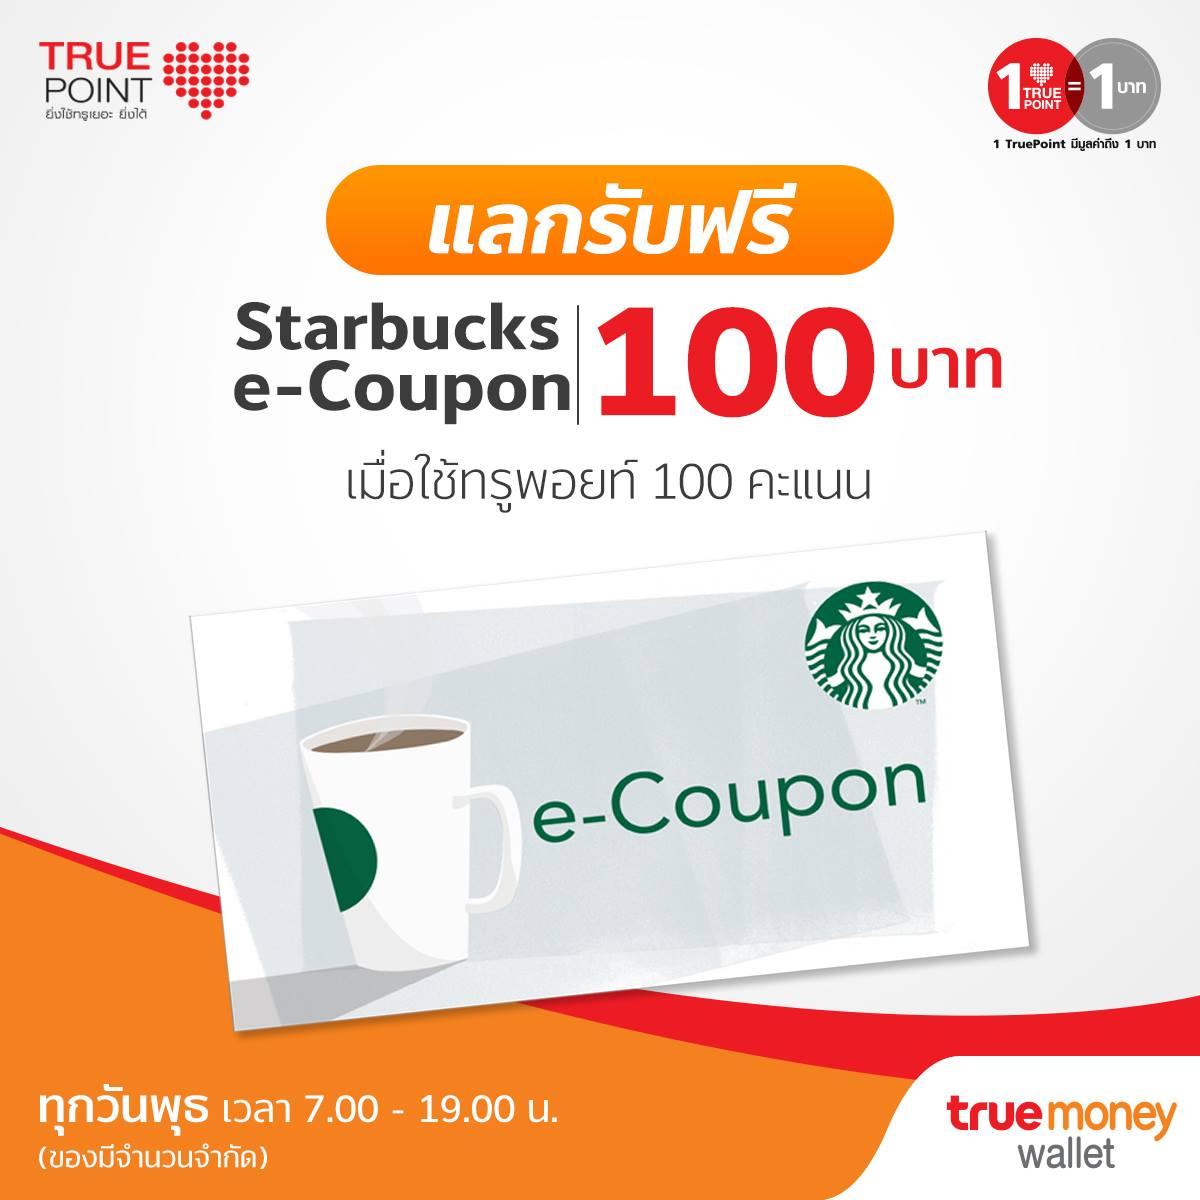 Starbucks e-Coupon